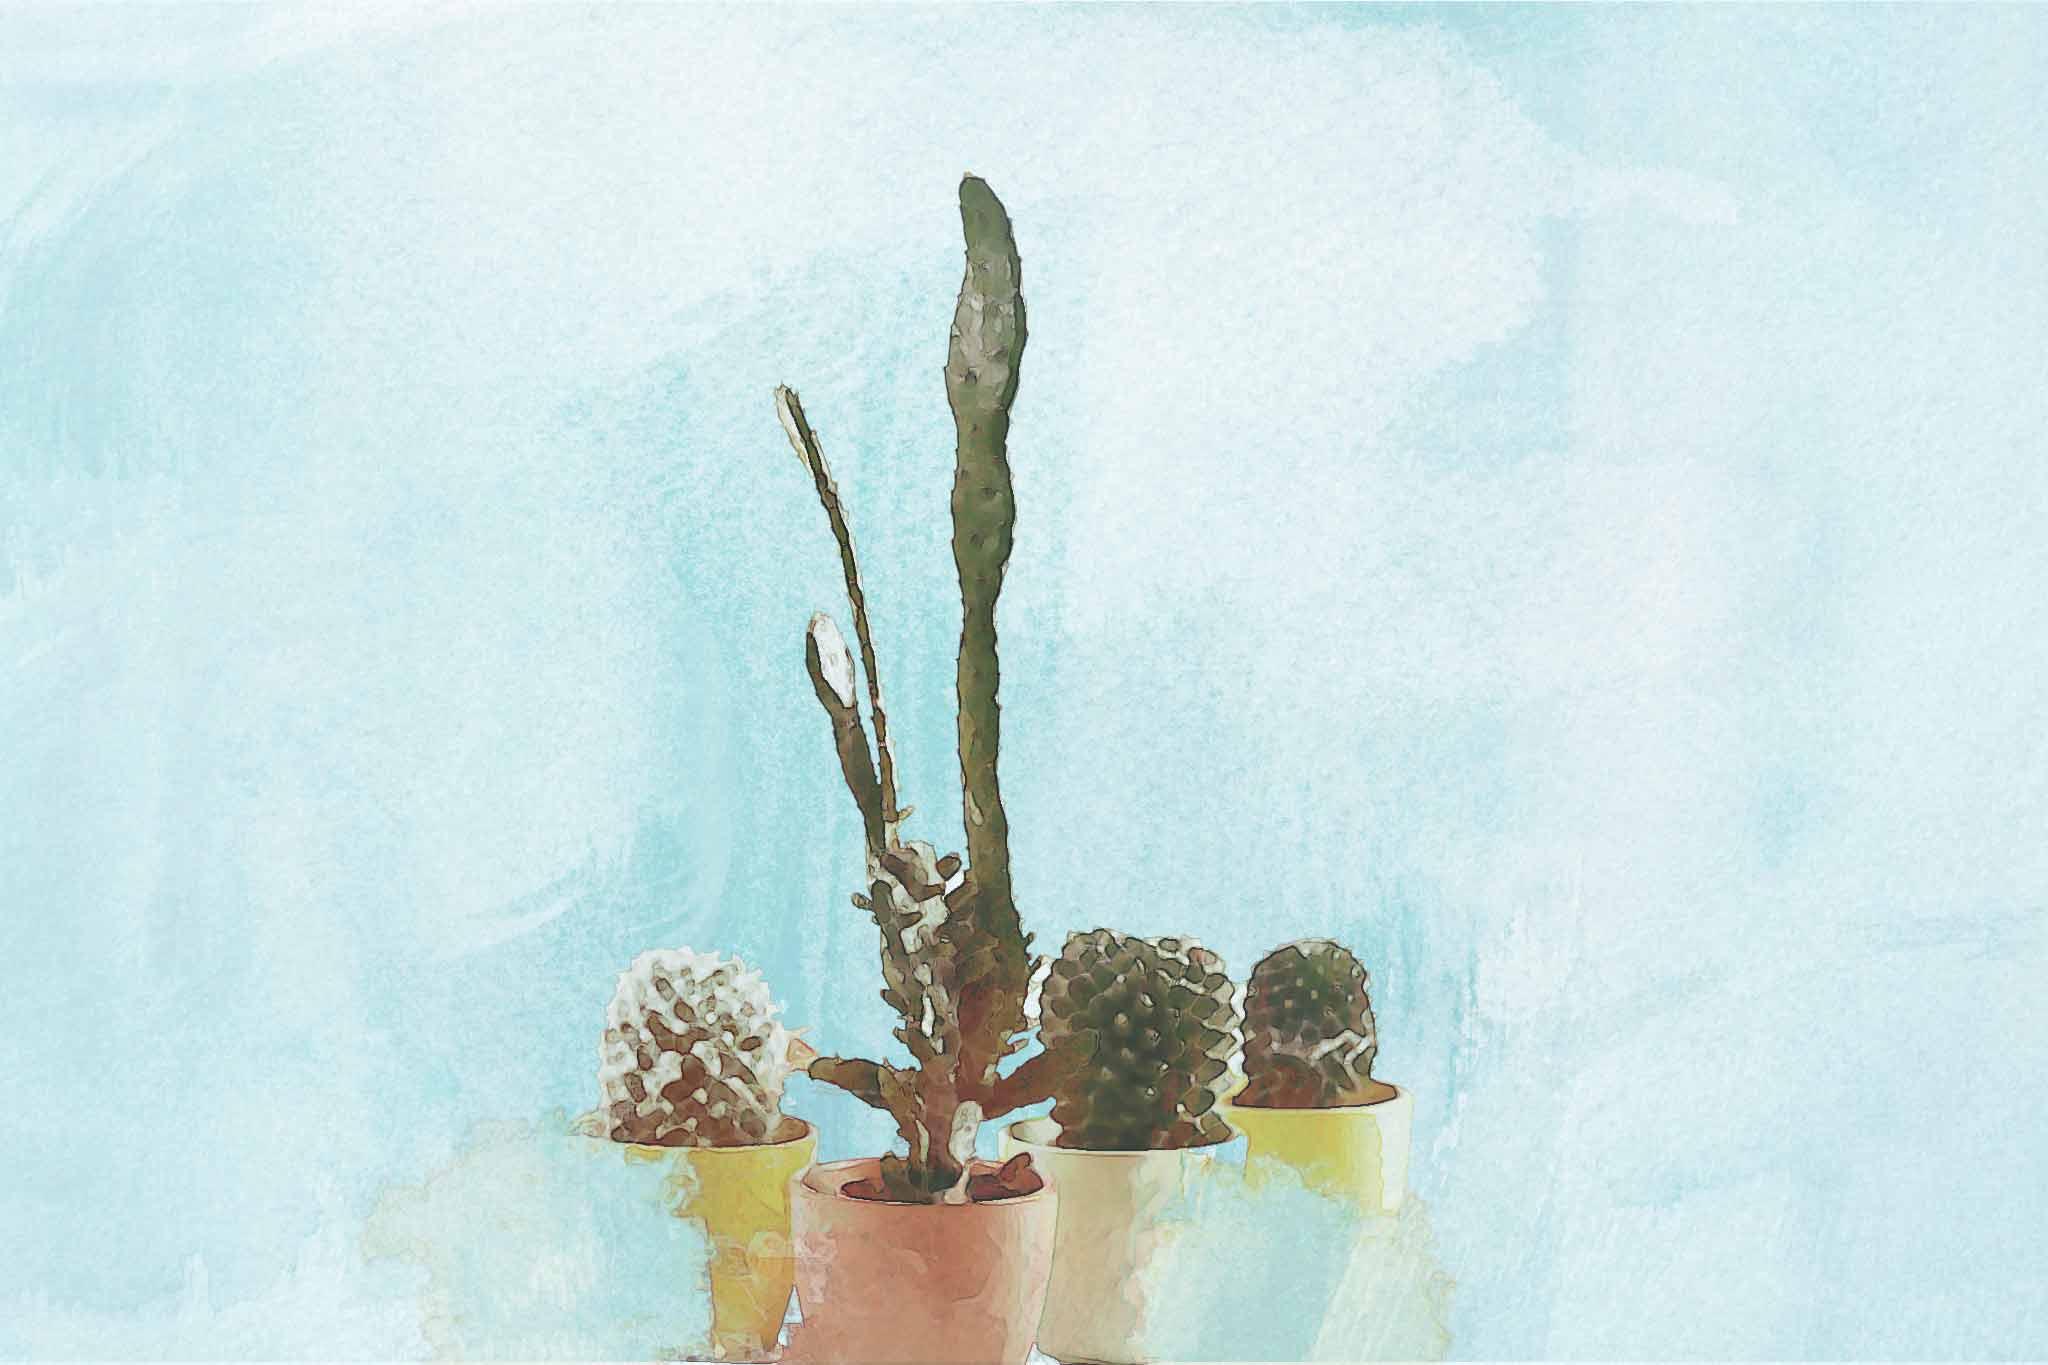 cactus green pot flowers